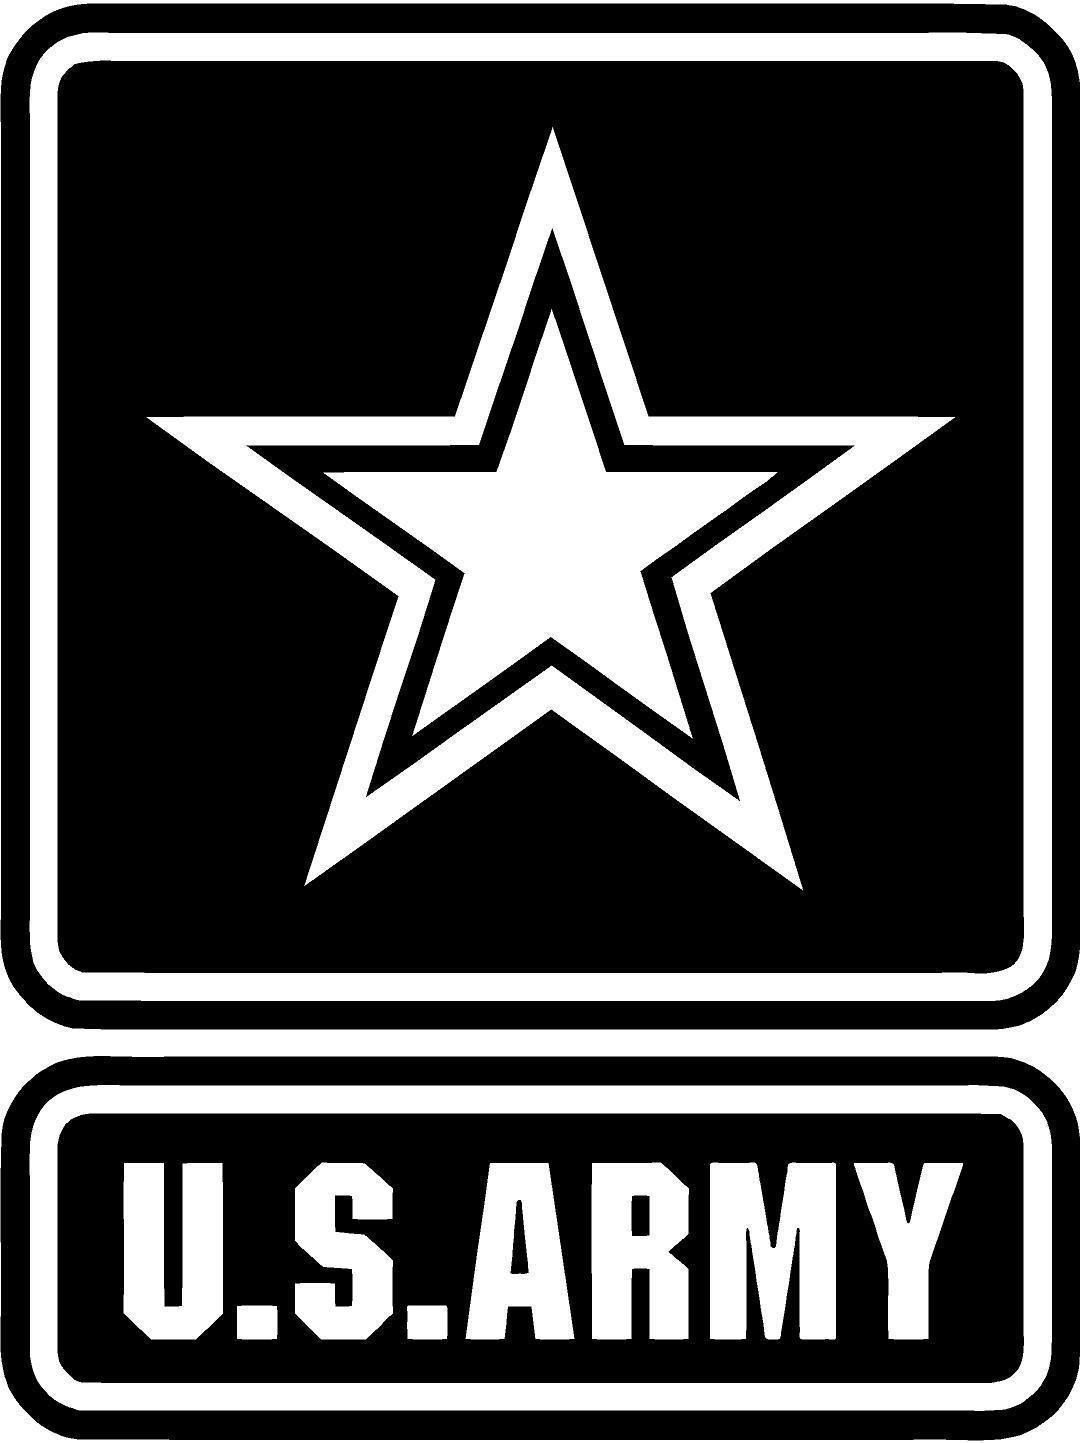 X2 Distressed Military Invasion Star Jeep Decal Sticker Vinyl USA Army